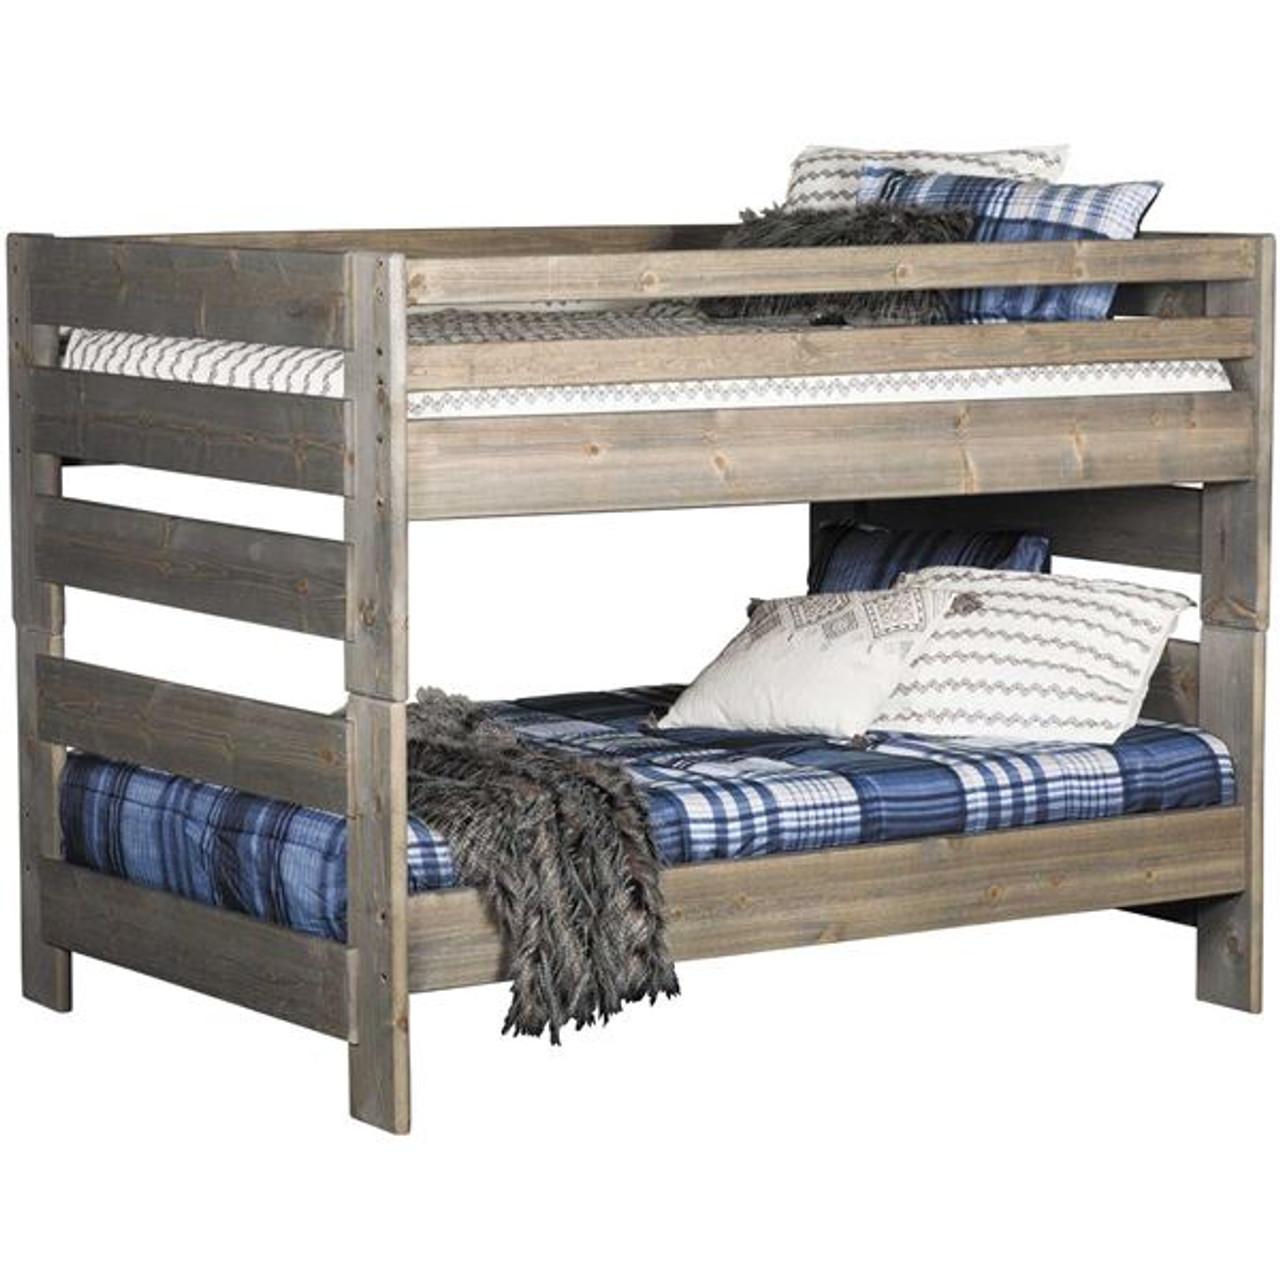 Picture of: Trendwood Bunkhouse Big Sky Full Full Bunk Bed Kids N Cribs